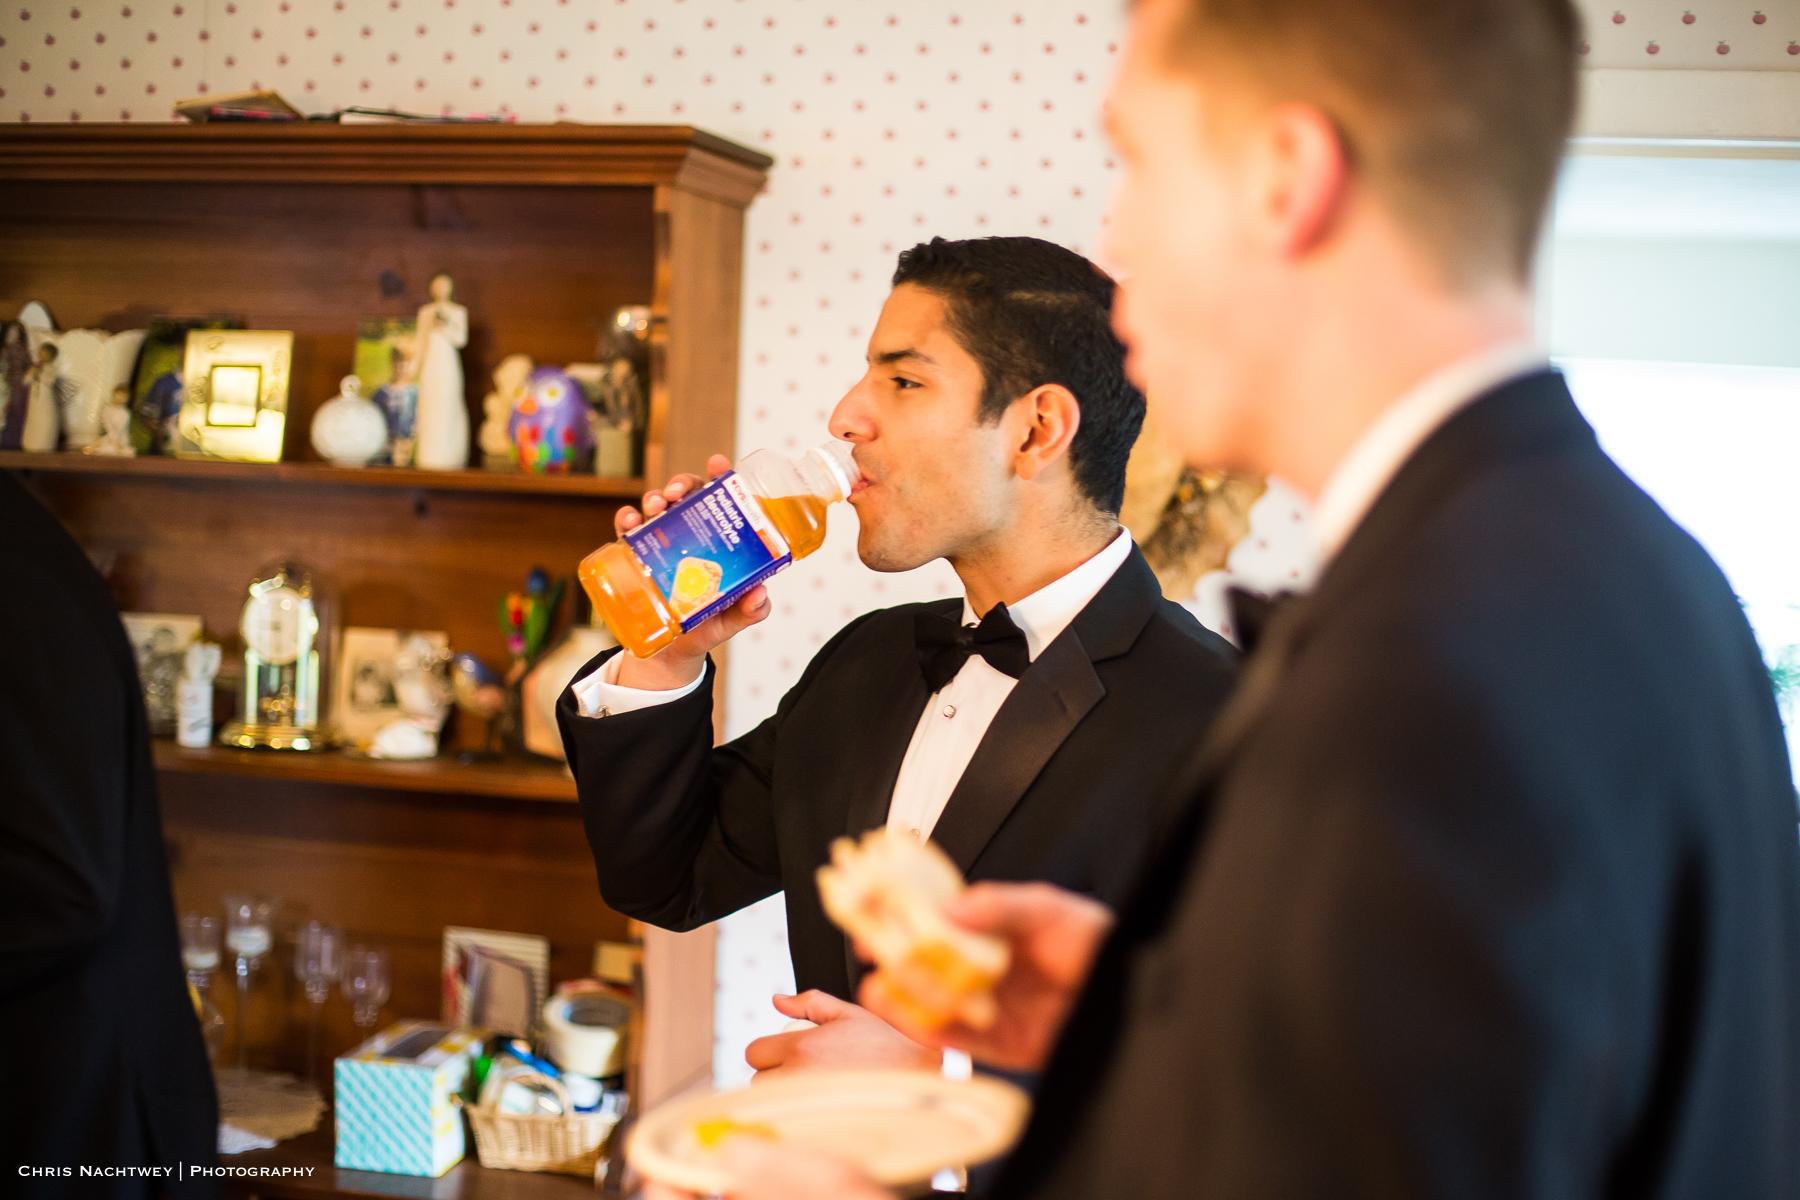 wedding-the-litchfield-inn-ct-photos-chris-nachtwey-photography-2018-5.jpg